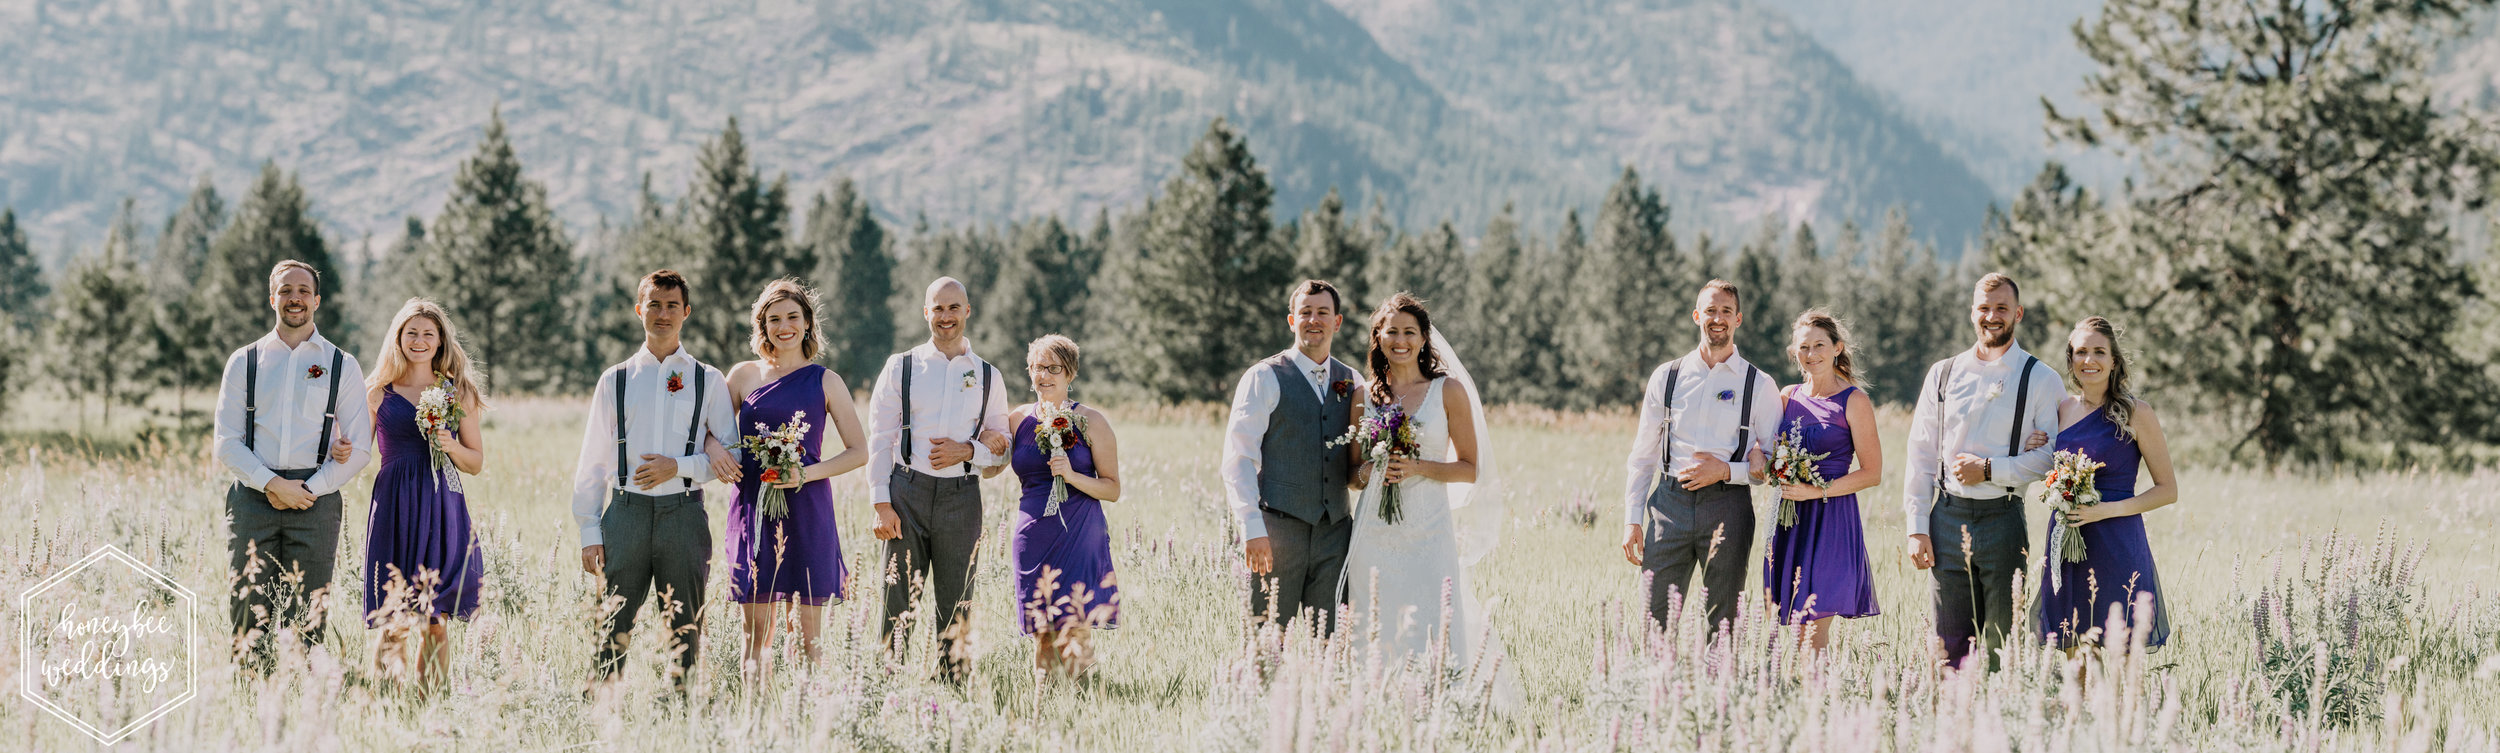 408 White Raven Wedding_Montana Wedding Photographer_Honeybee Weddings_ Meghan Maloney + Arza Hammond 2018-8883-Pano.jpg